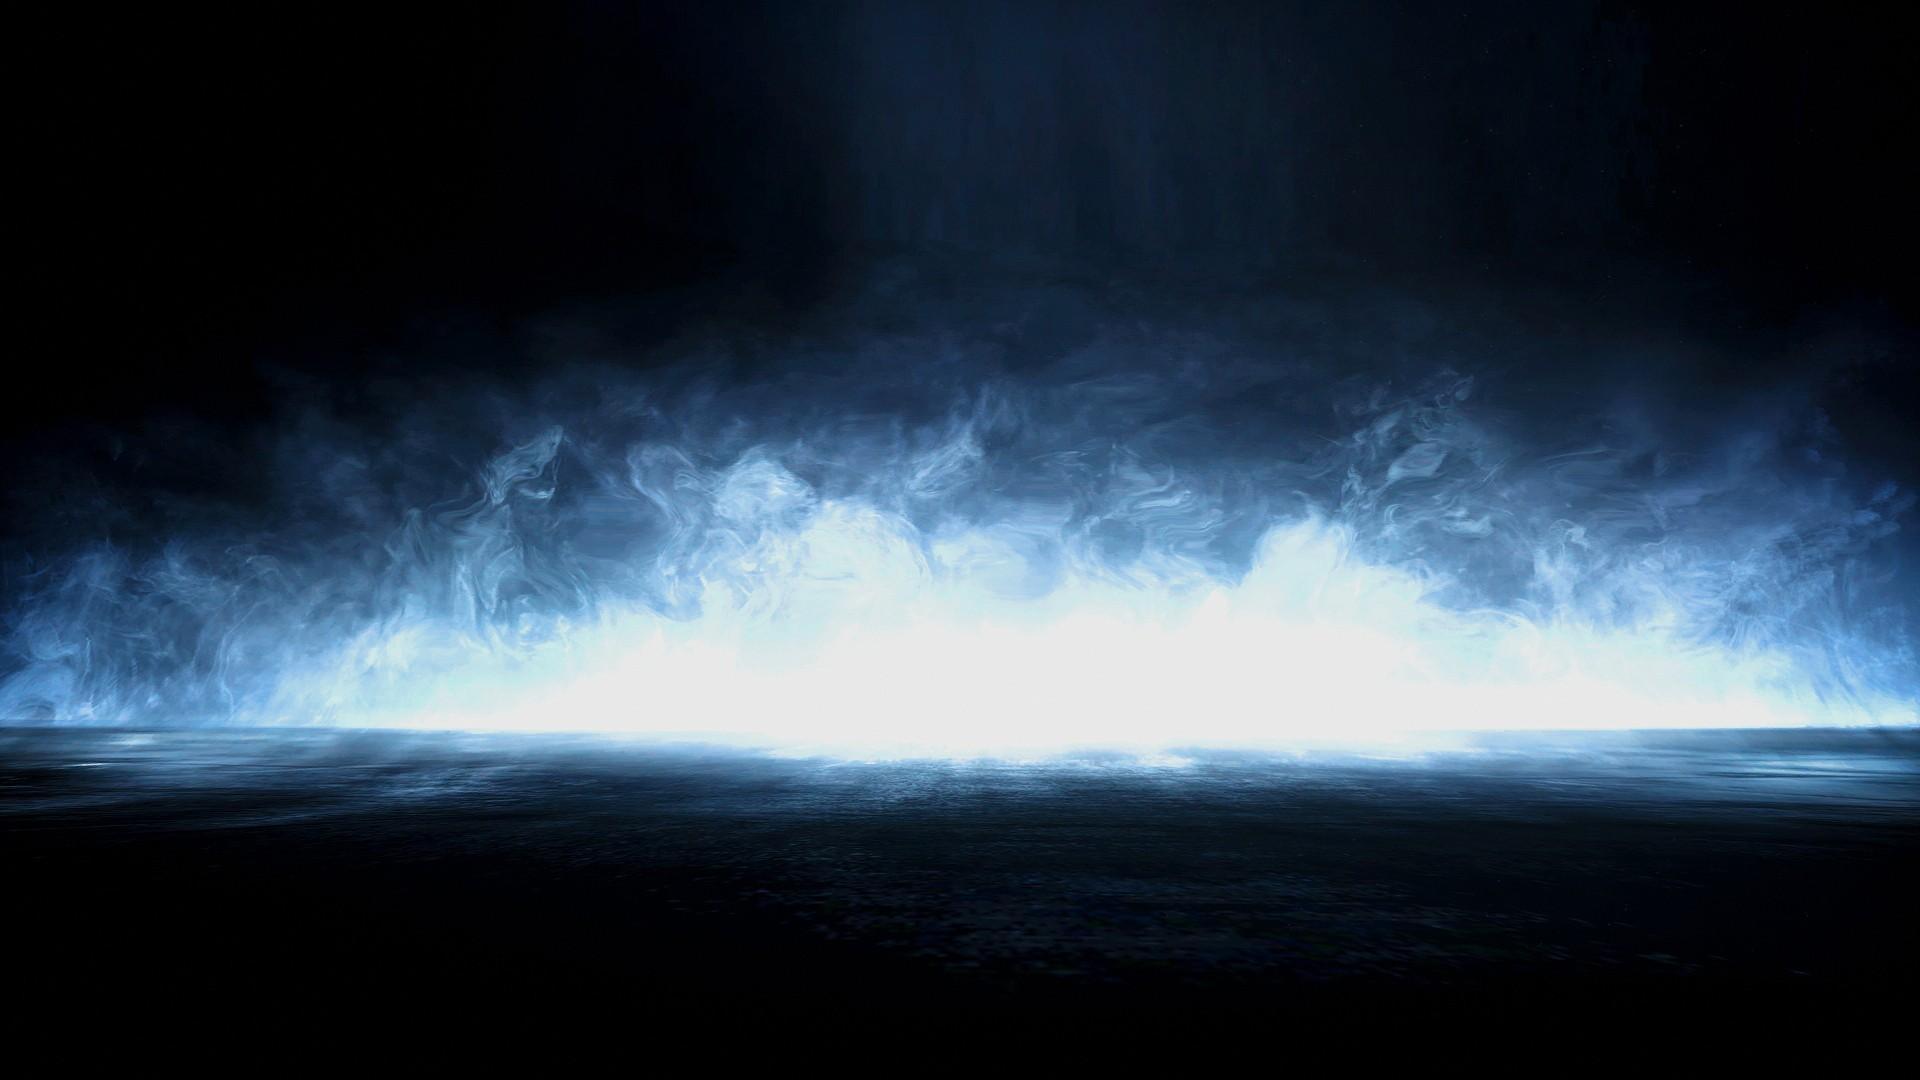 Wallpaper download moving - Gallery For Gt Black Fog Wallpaper